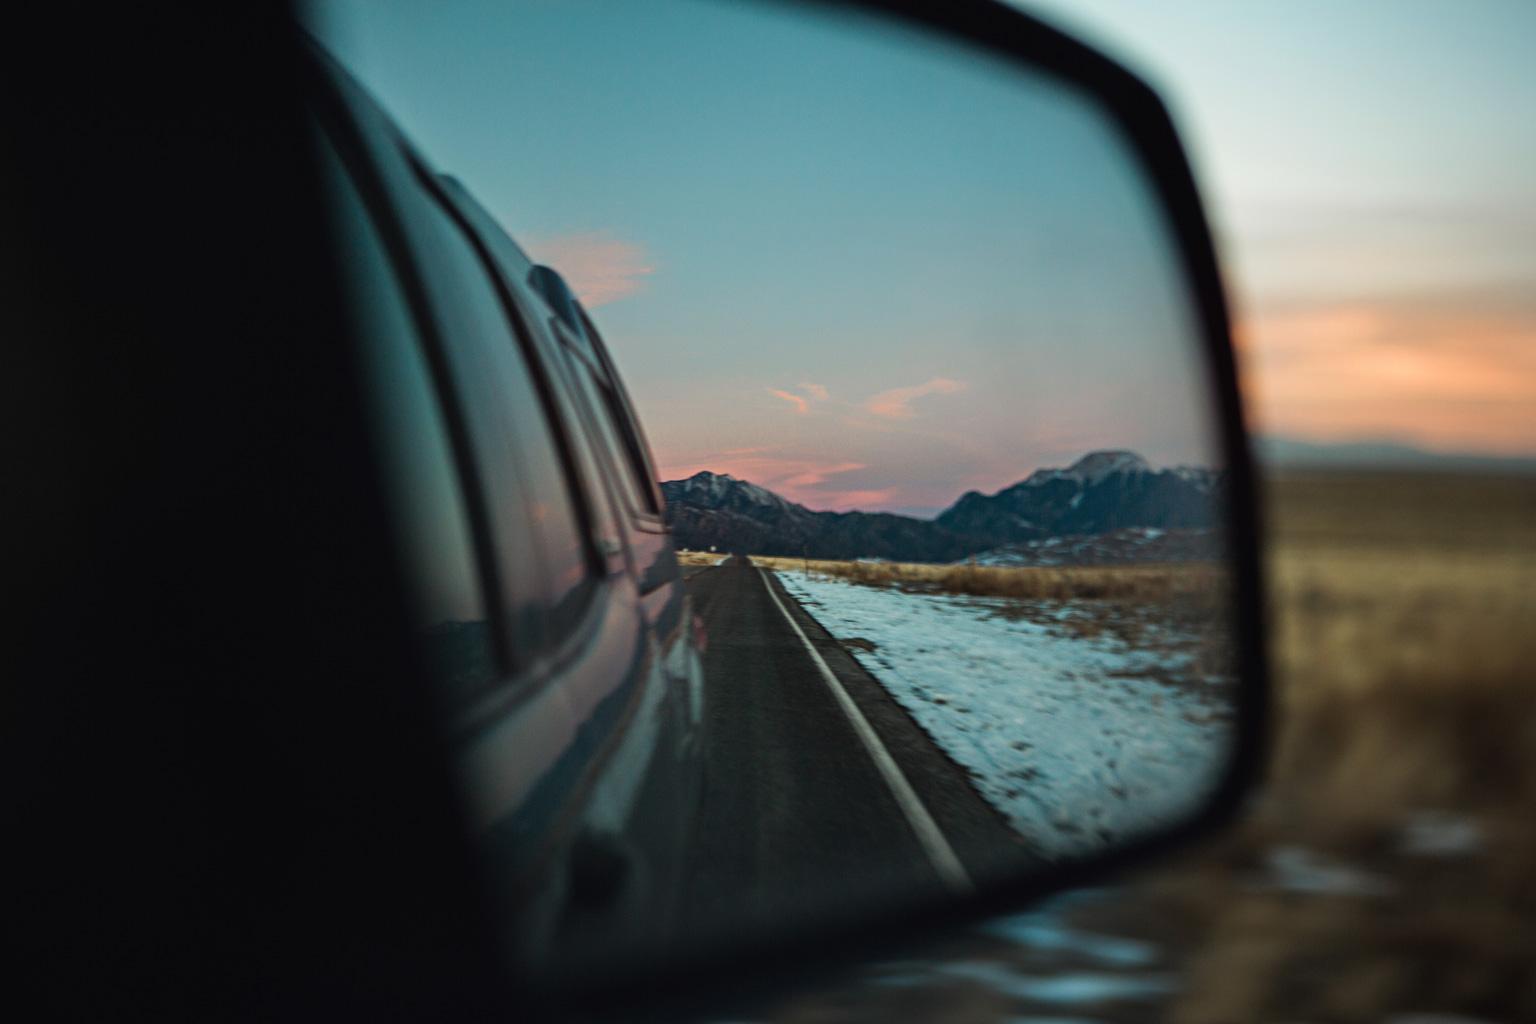 CindyGiovagnoli_Great_Sand_Dunes_National_Park_NPS_Colorado_roadtrip-019.jpg